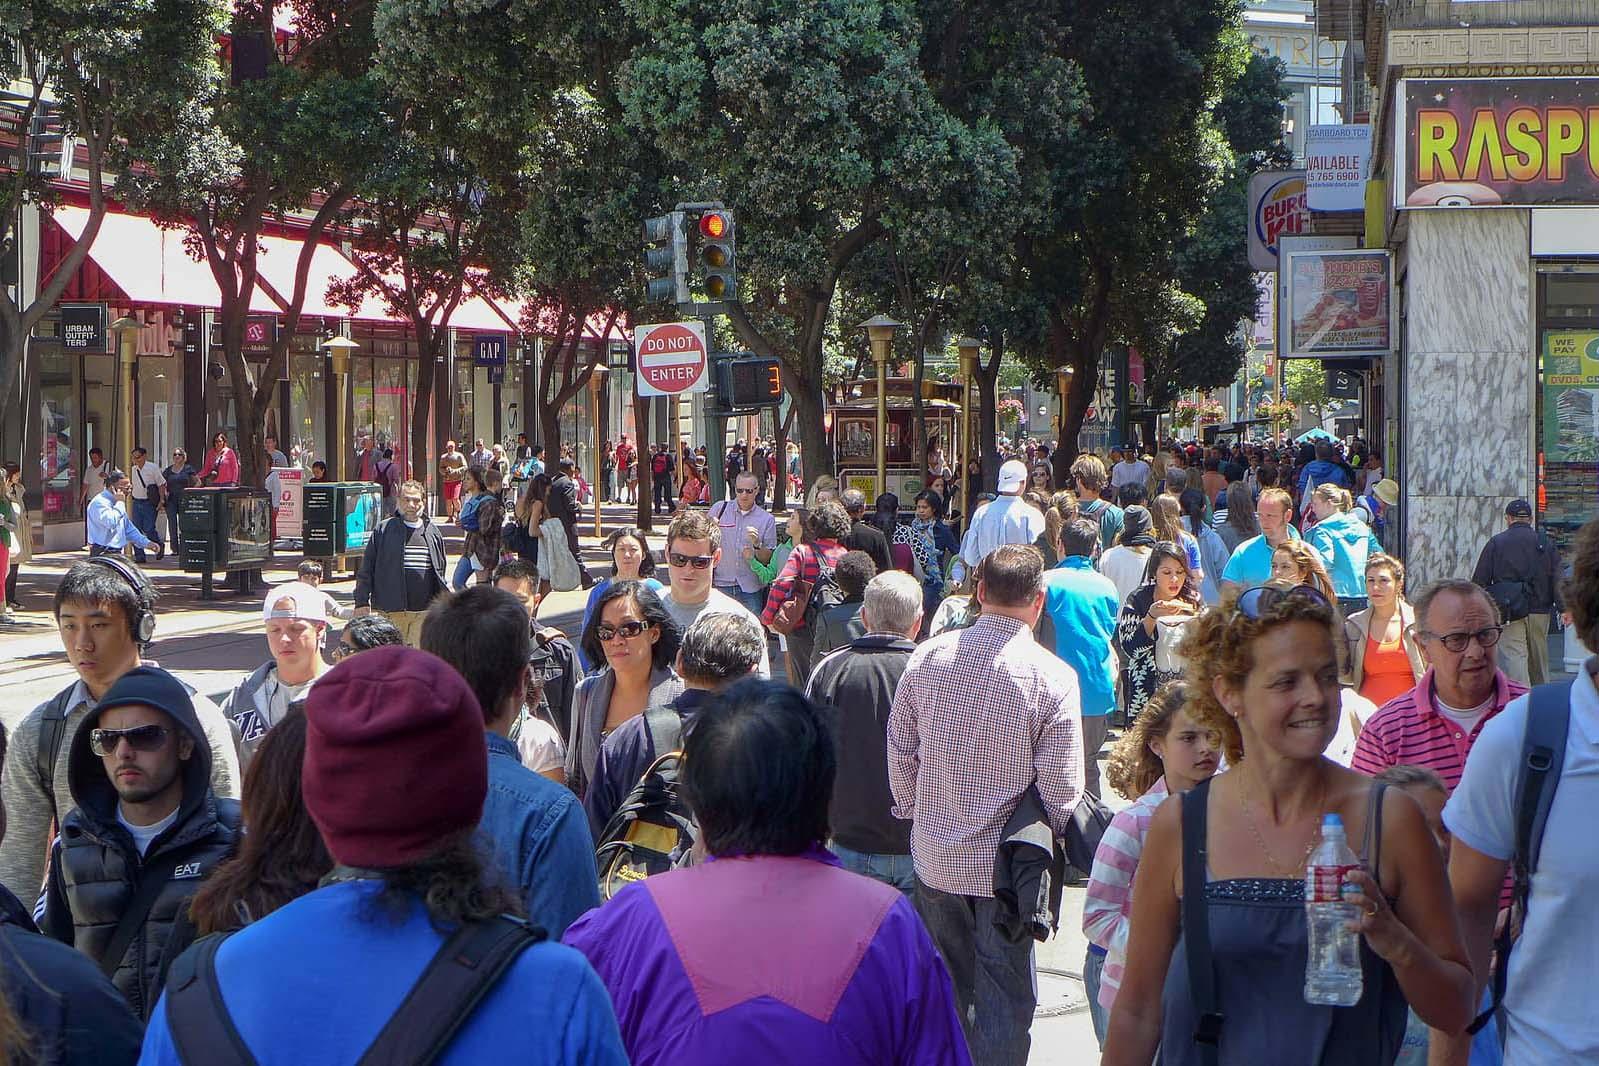 Crowd of pedestrians on a city street